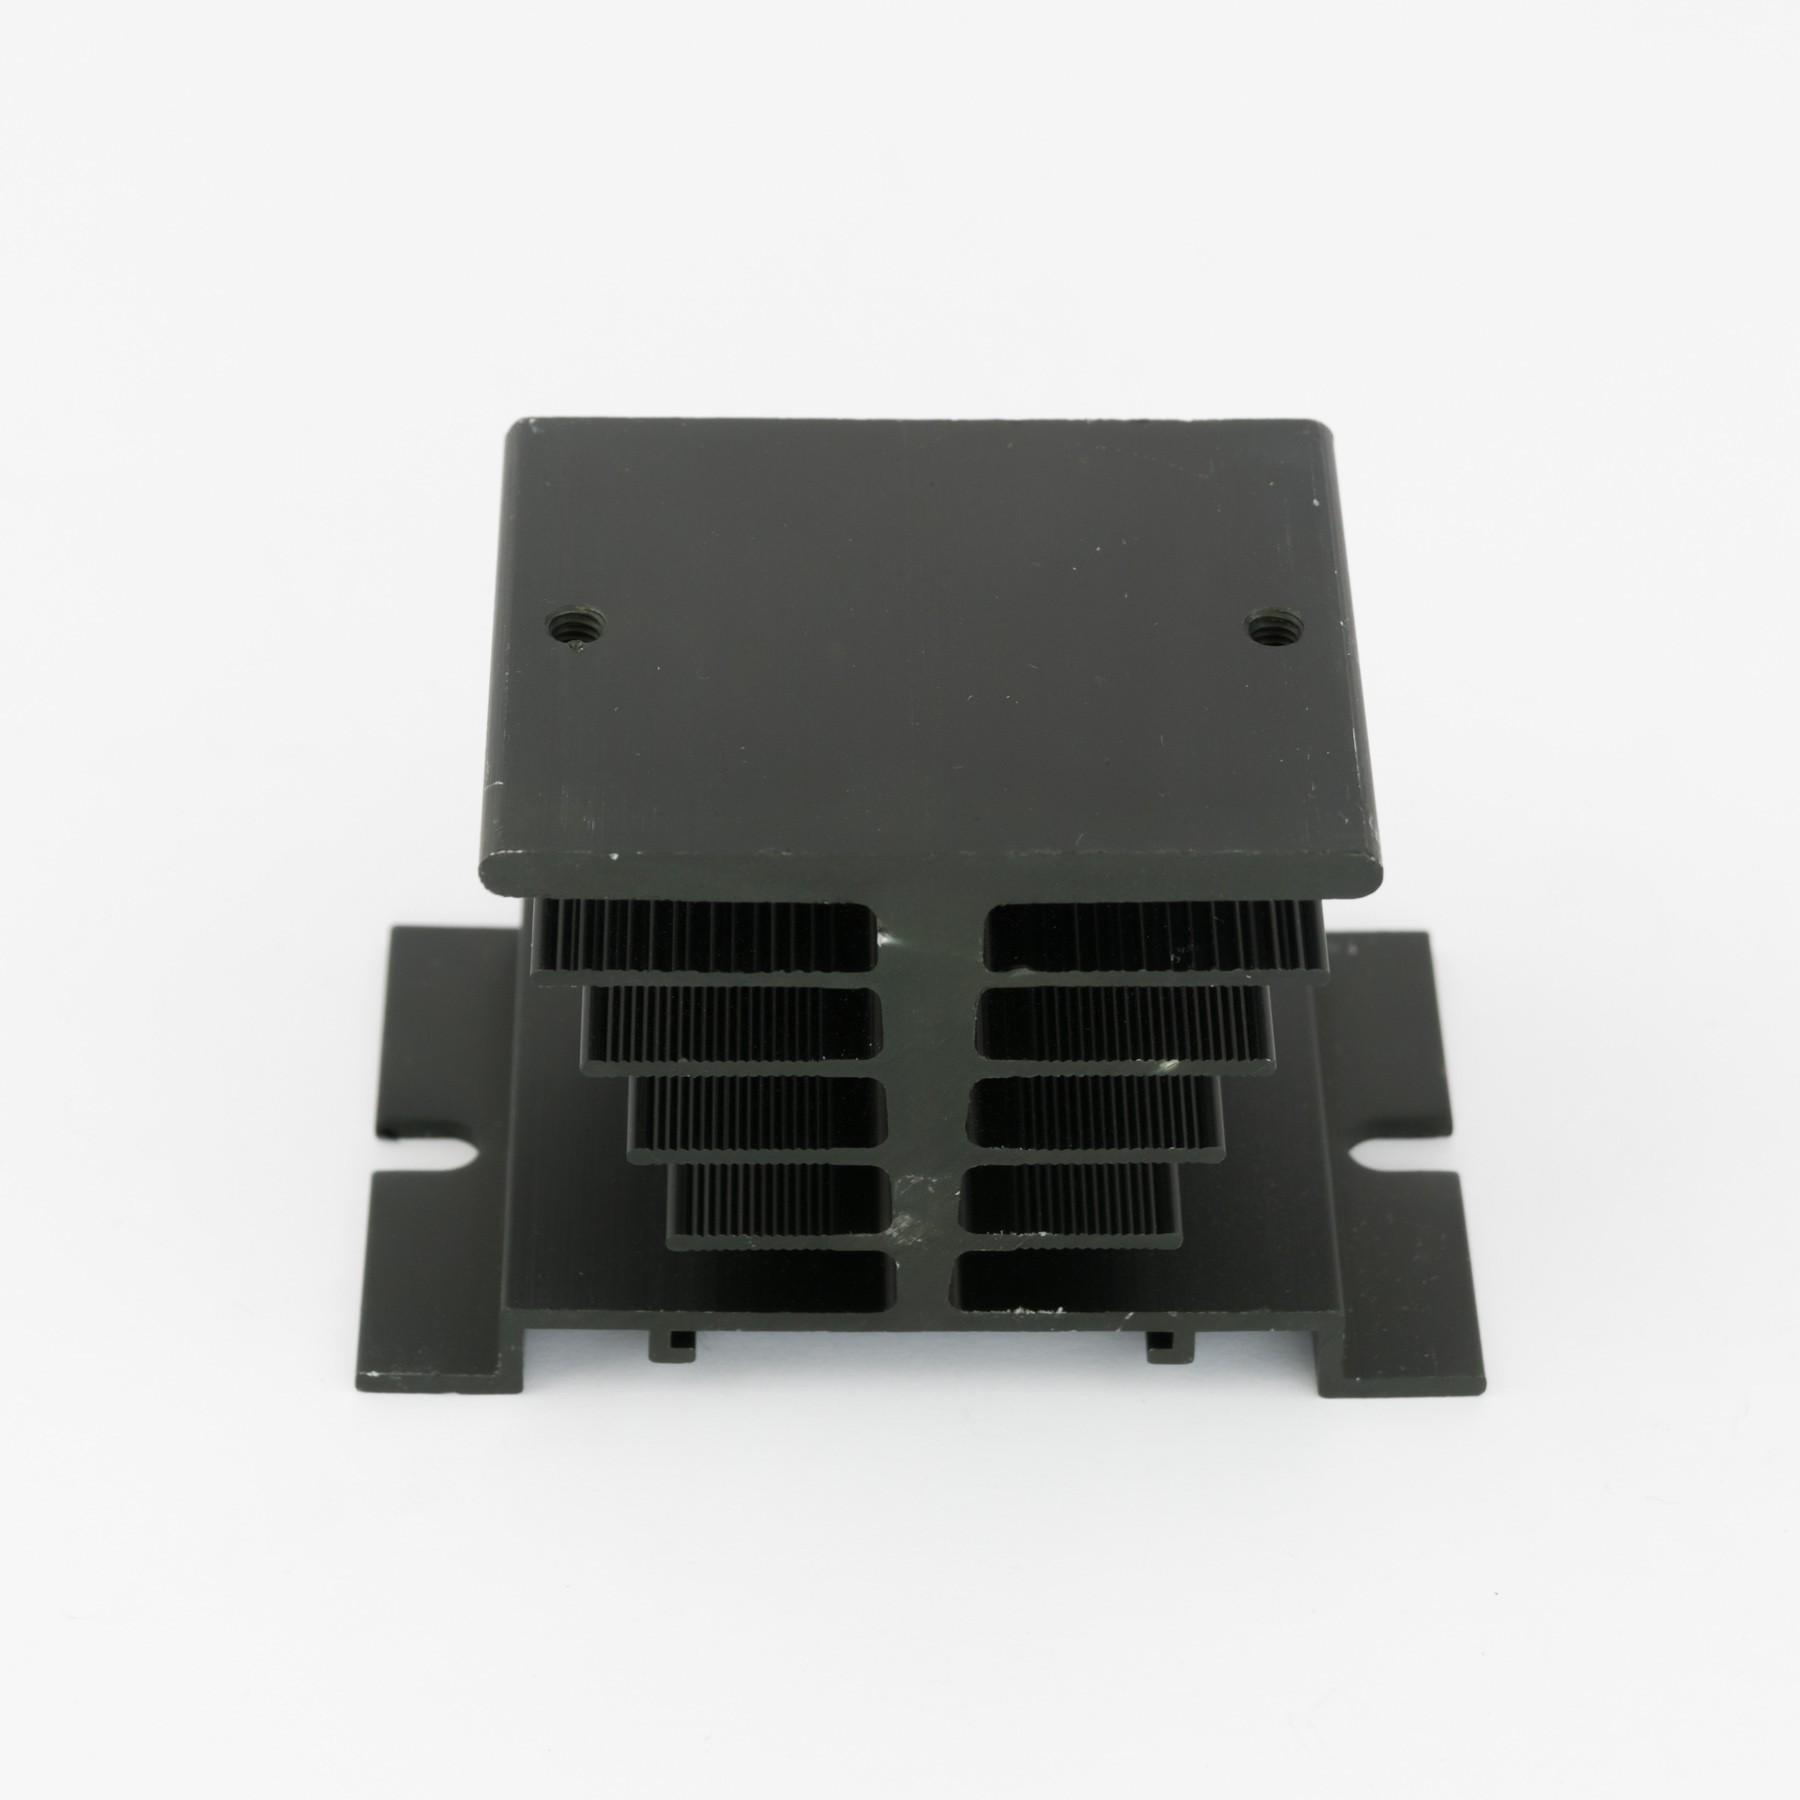 SSR heat sink